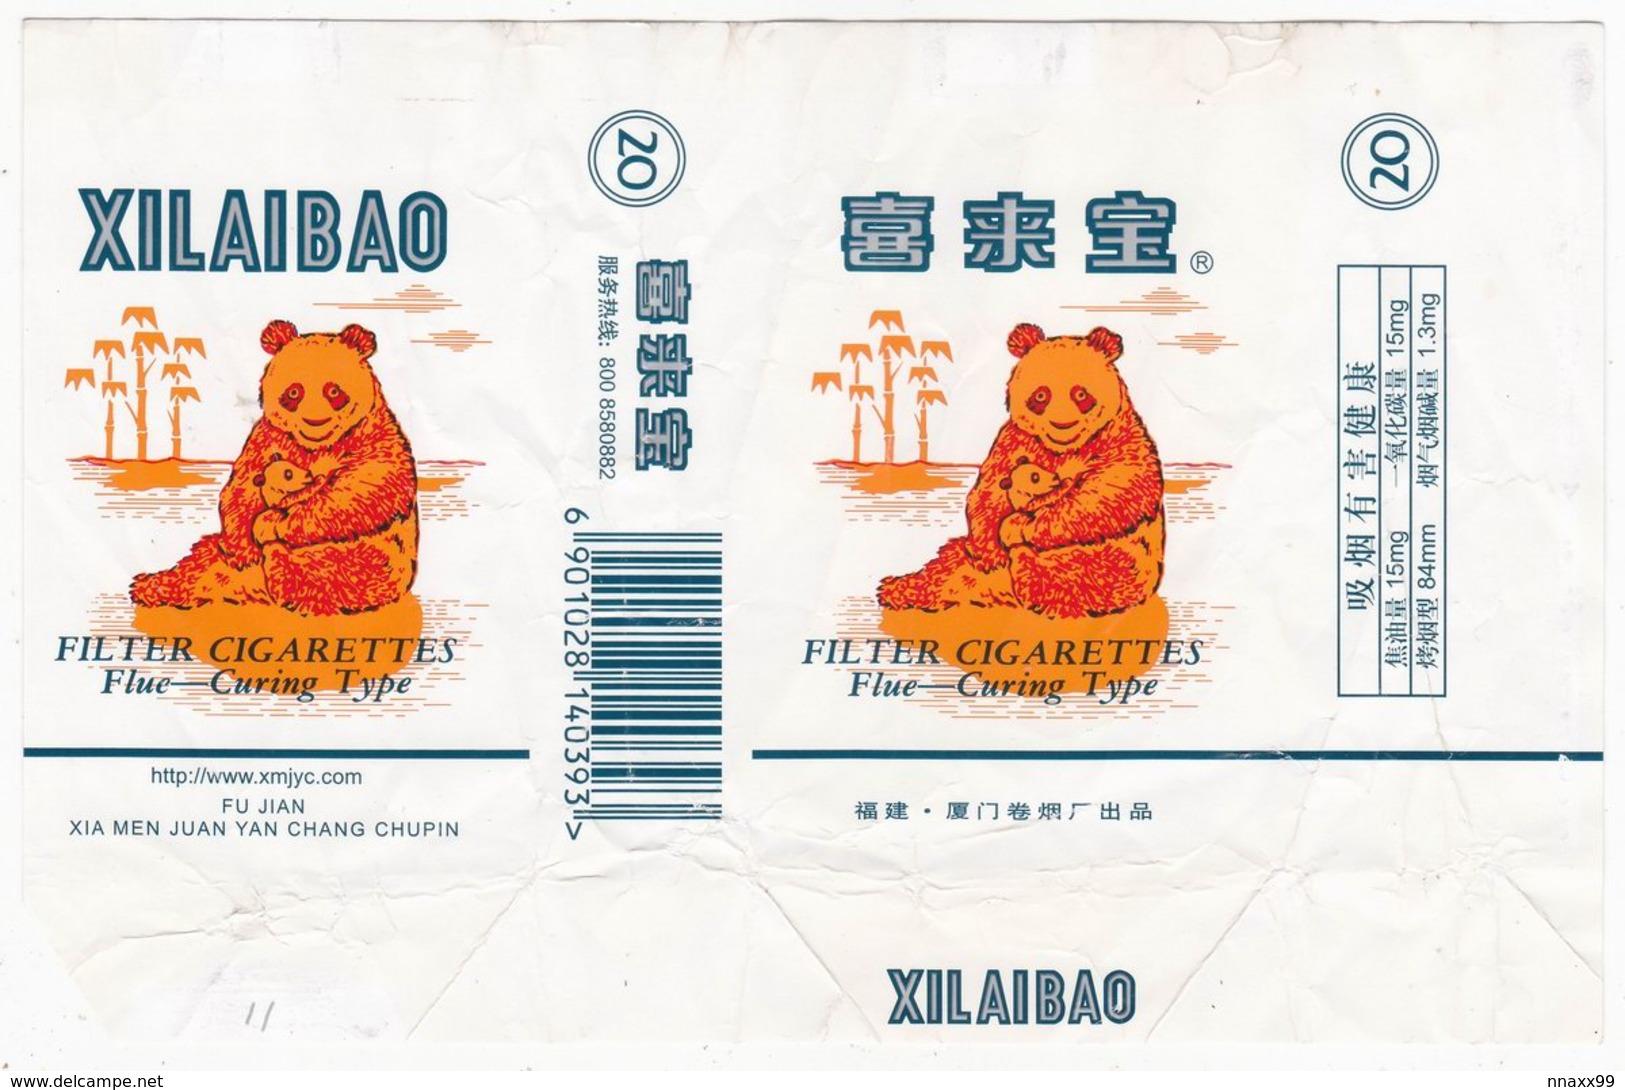 Panda - Giant Panda, XILAIBAO Cigarette Box, Solf, White, Xiamen Cigarette Factory, Fujian, China - Empty Cigarettes Boxes